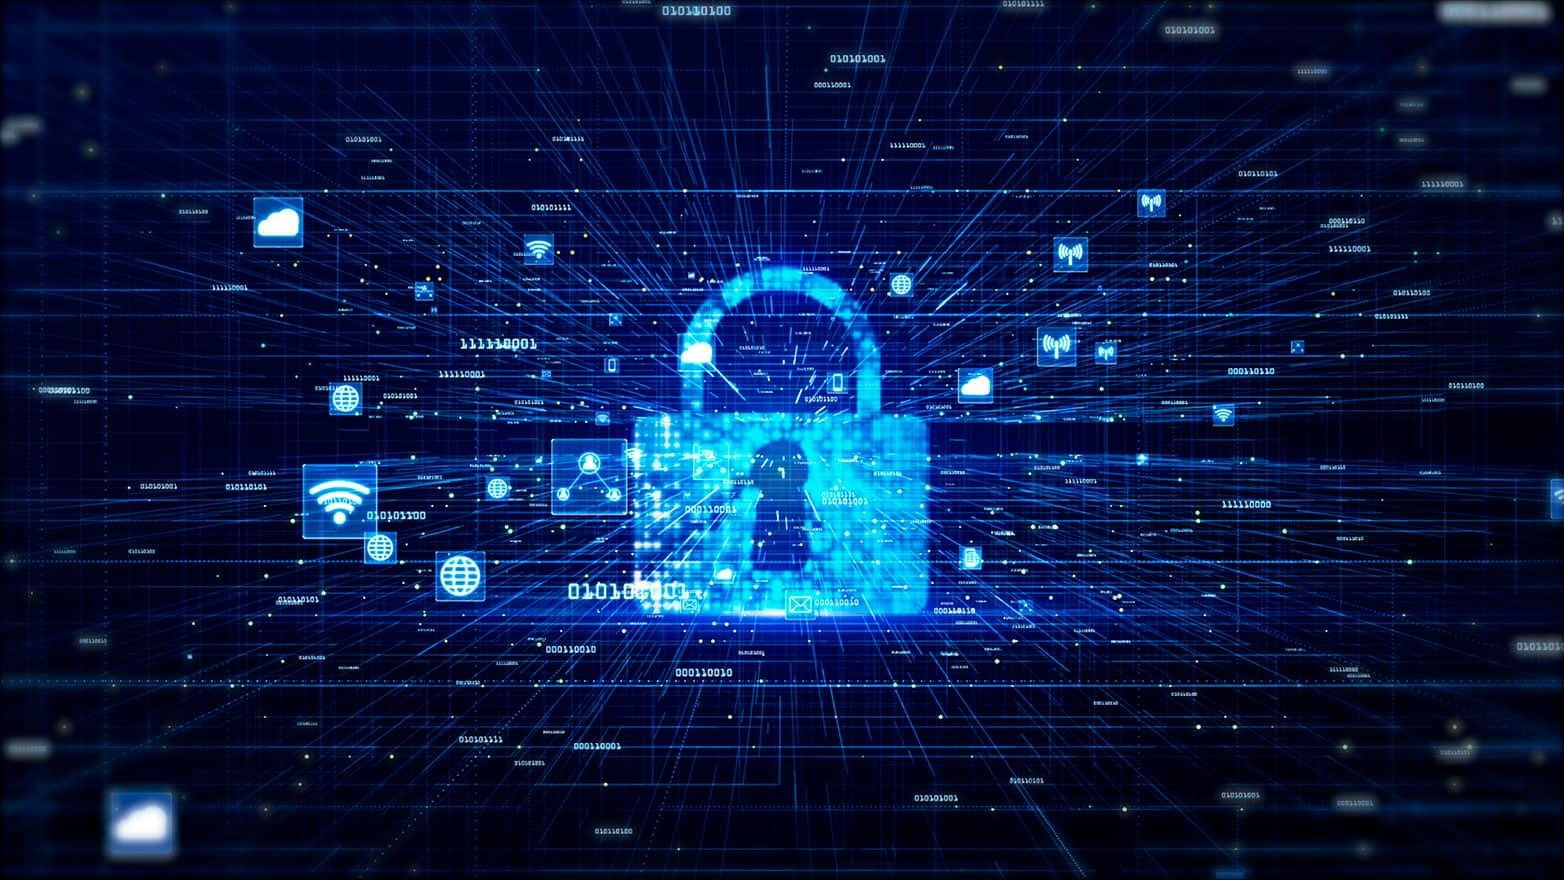 WiFiber VPN Image | Εικονικό Ιδιωτικό Δίκτυο